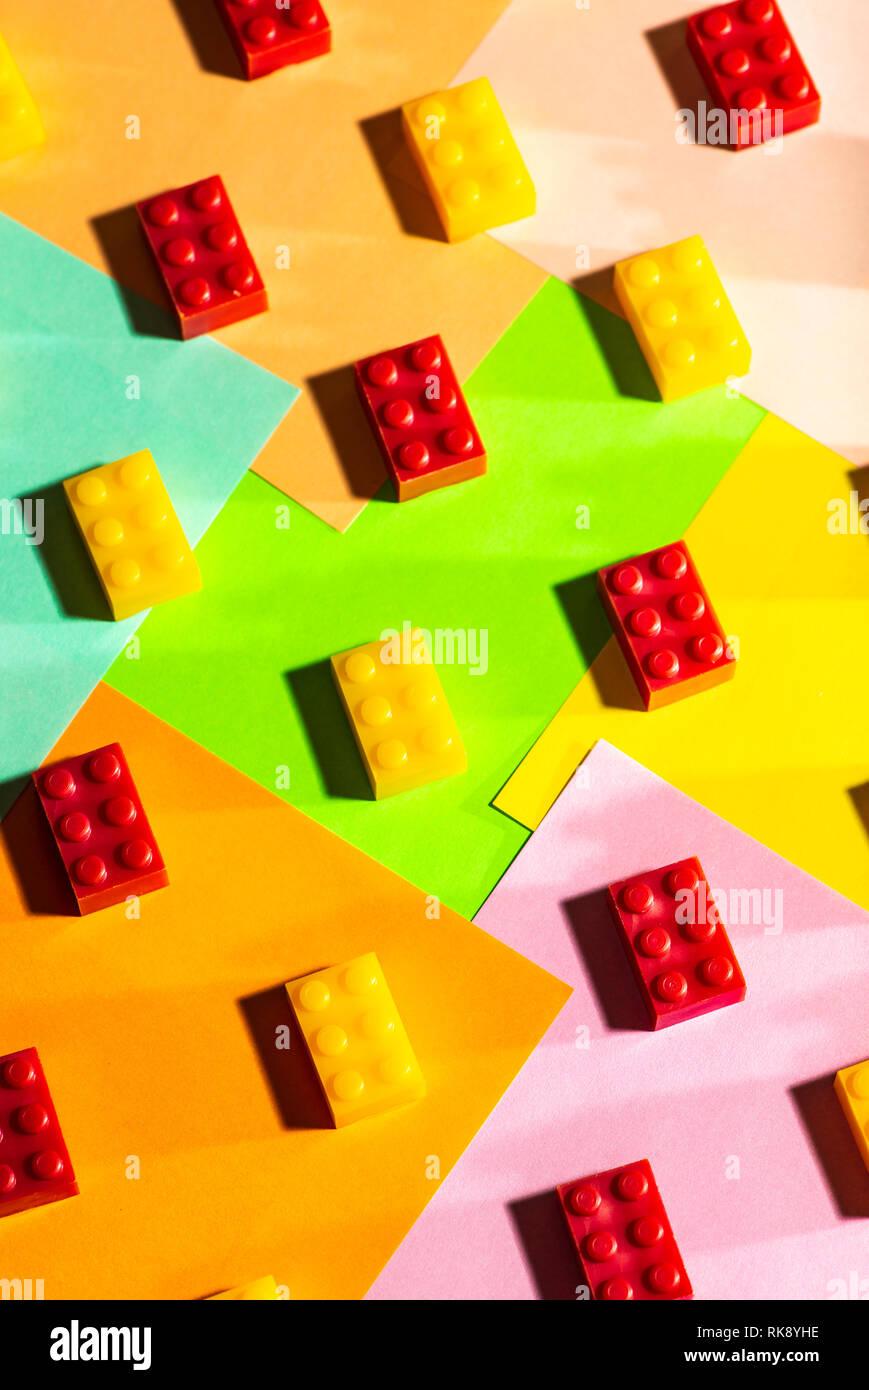 Plastic geometric cubes  Construction toys on geometric